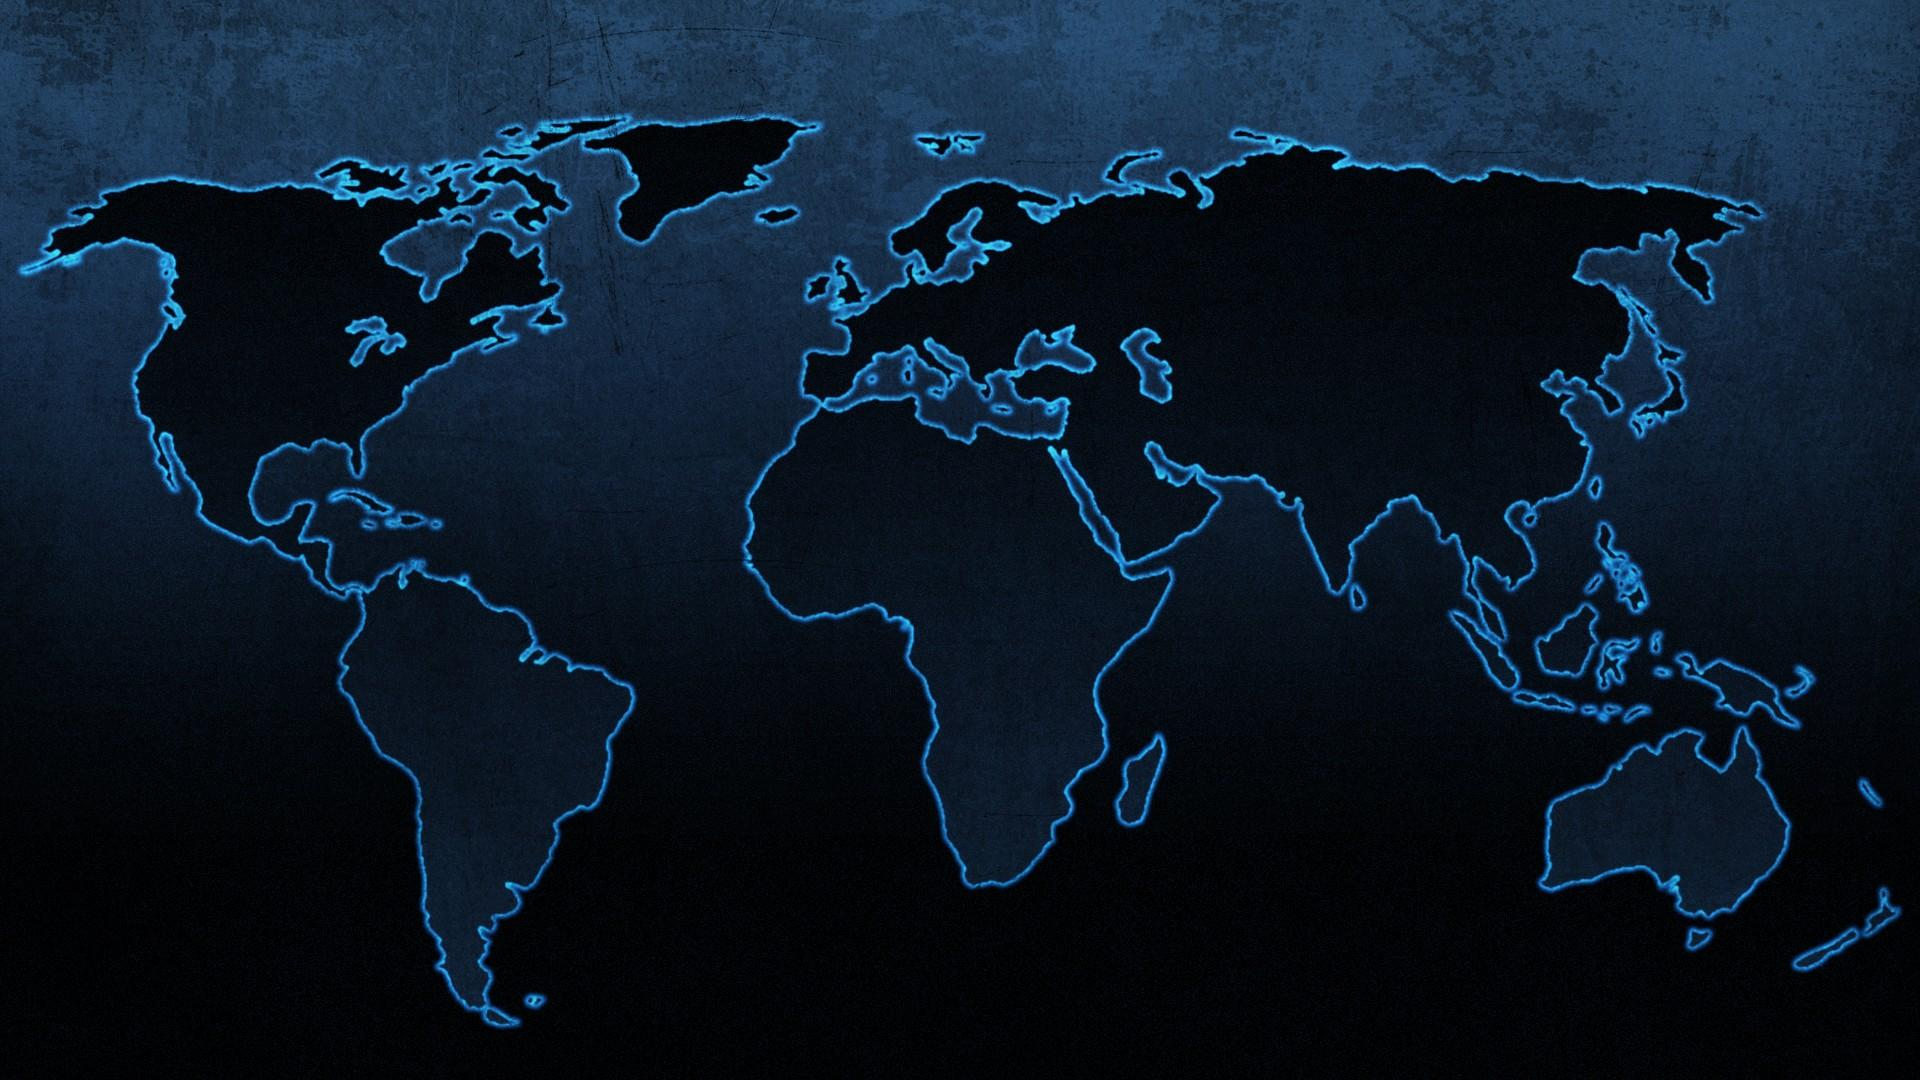 Blue continents maps world map wallpaper 79192 1920x1080